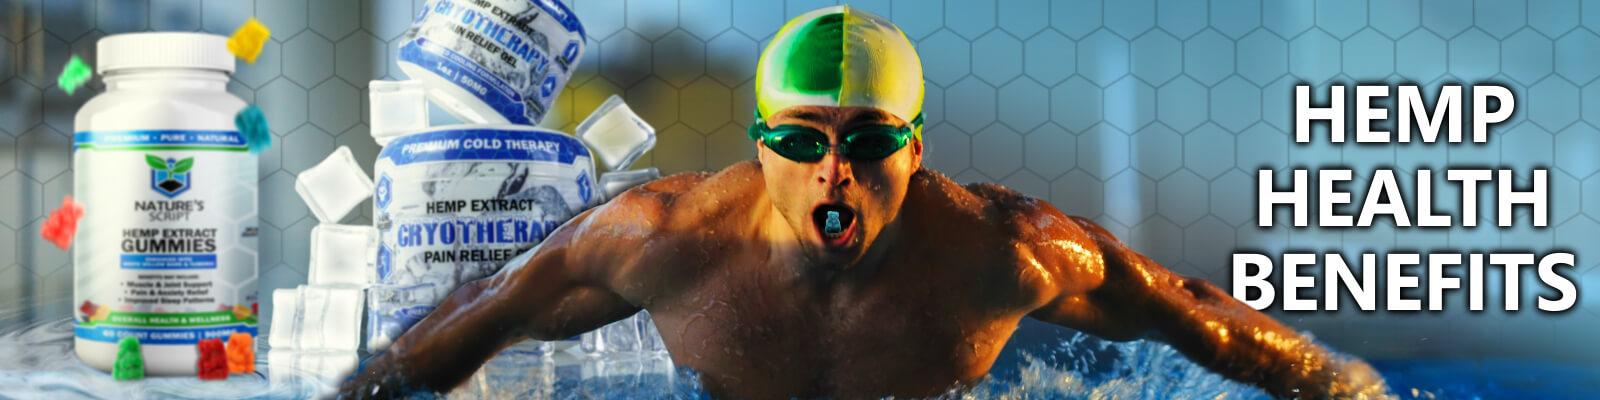 hemp health benefits man swimming